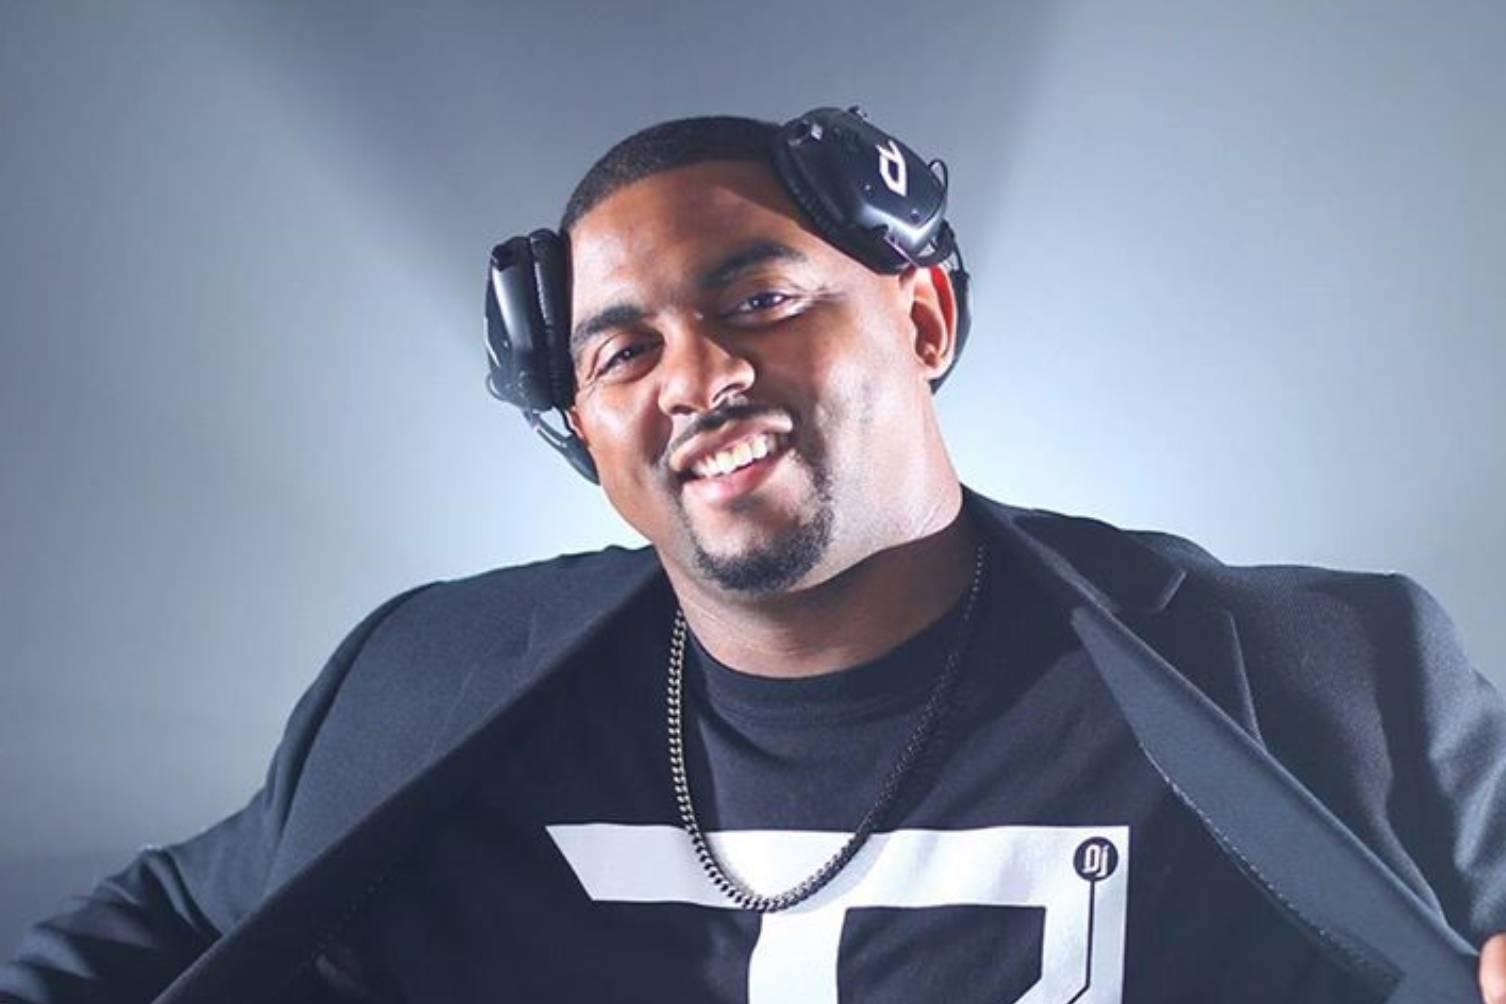 DJ Tony Dub